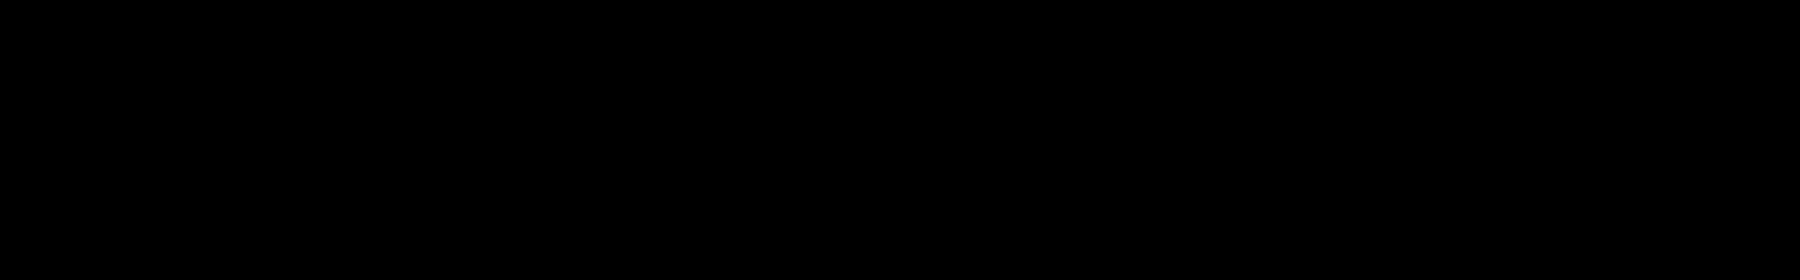 FSTVL ANTHMZ audio waveform